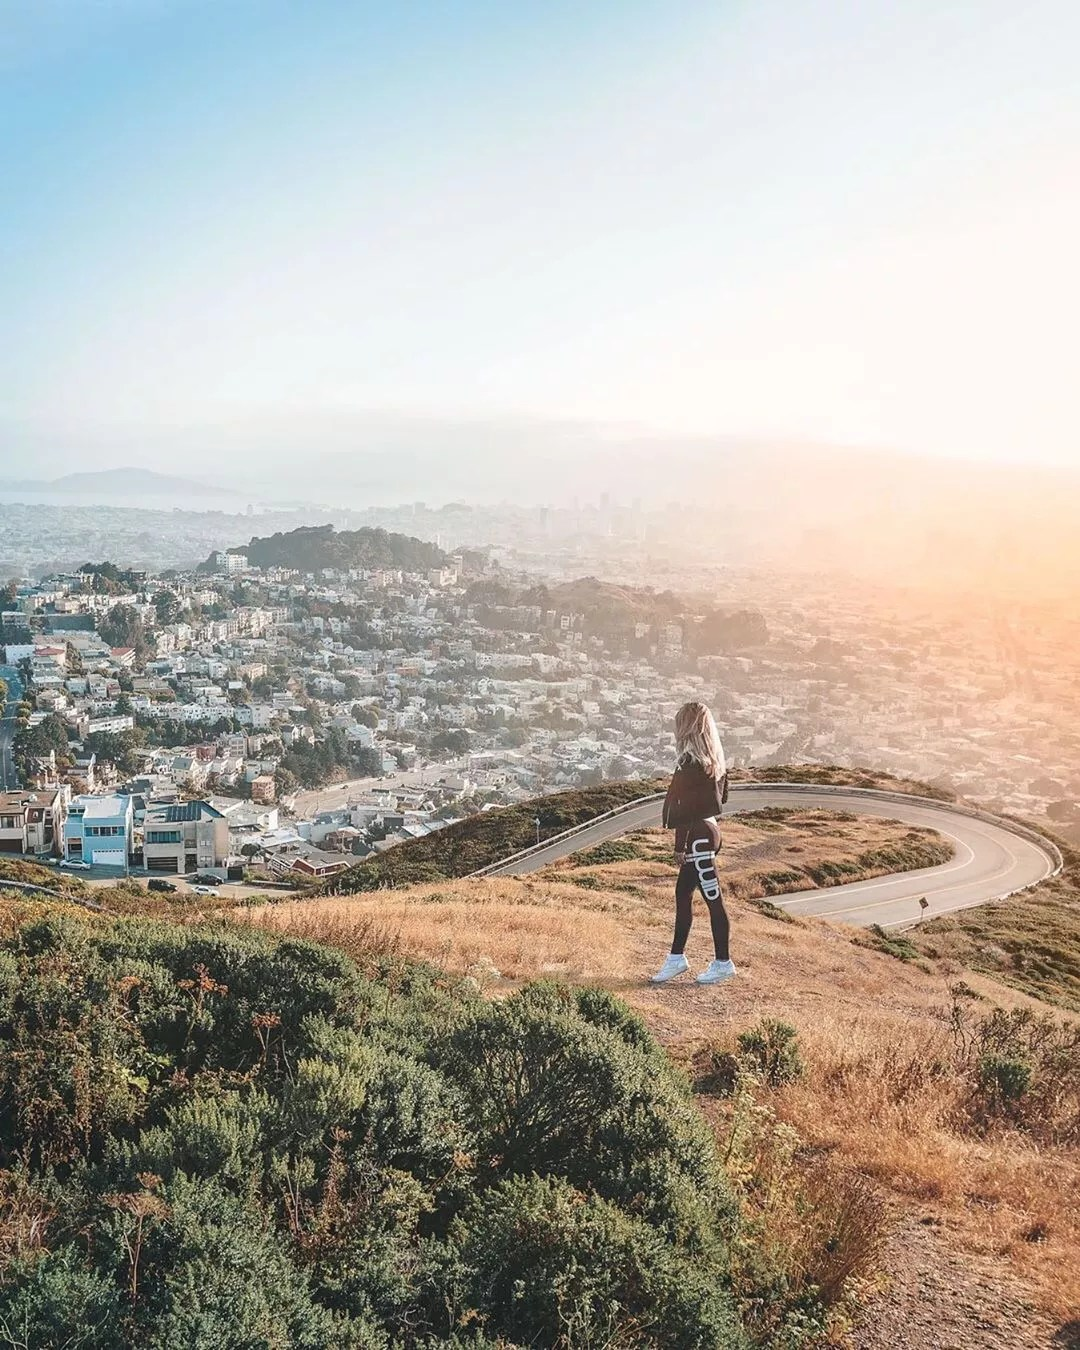 Woman hiking near San Francisco, CA. Photo by Instagram user @raphiella_x3